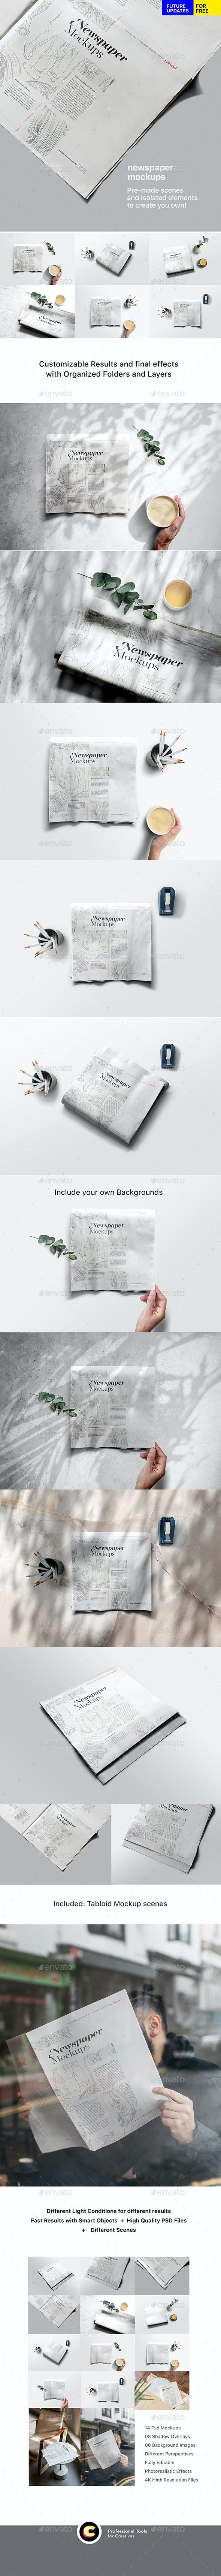 Newspaper Adverts Mockups - Miscellaneous Print